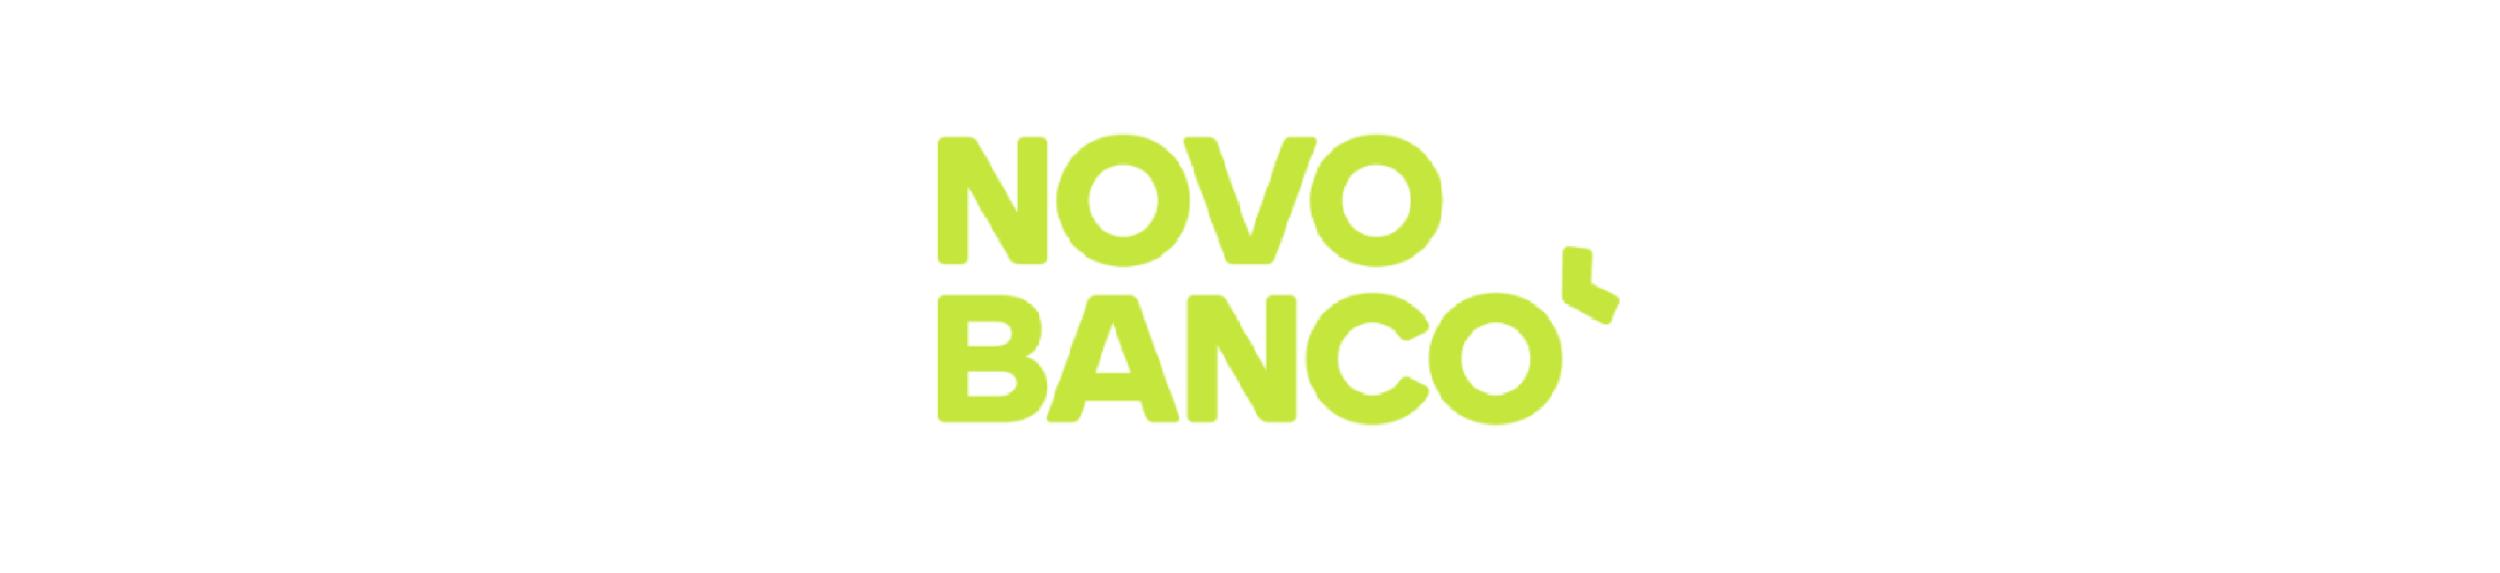 novobanco.png